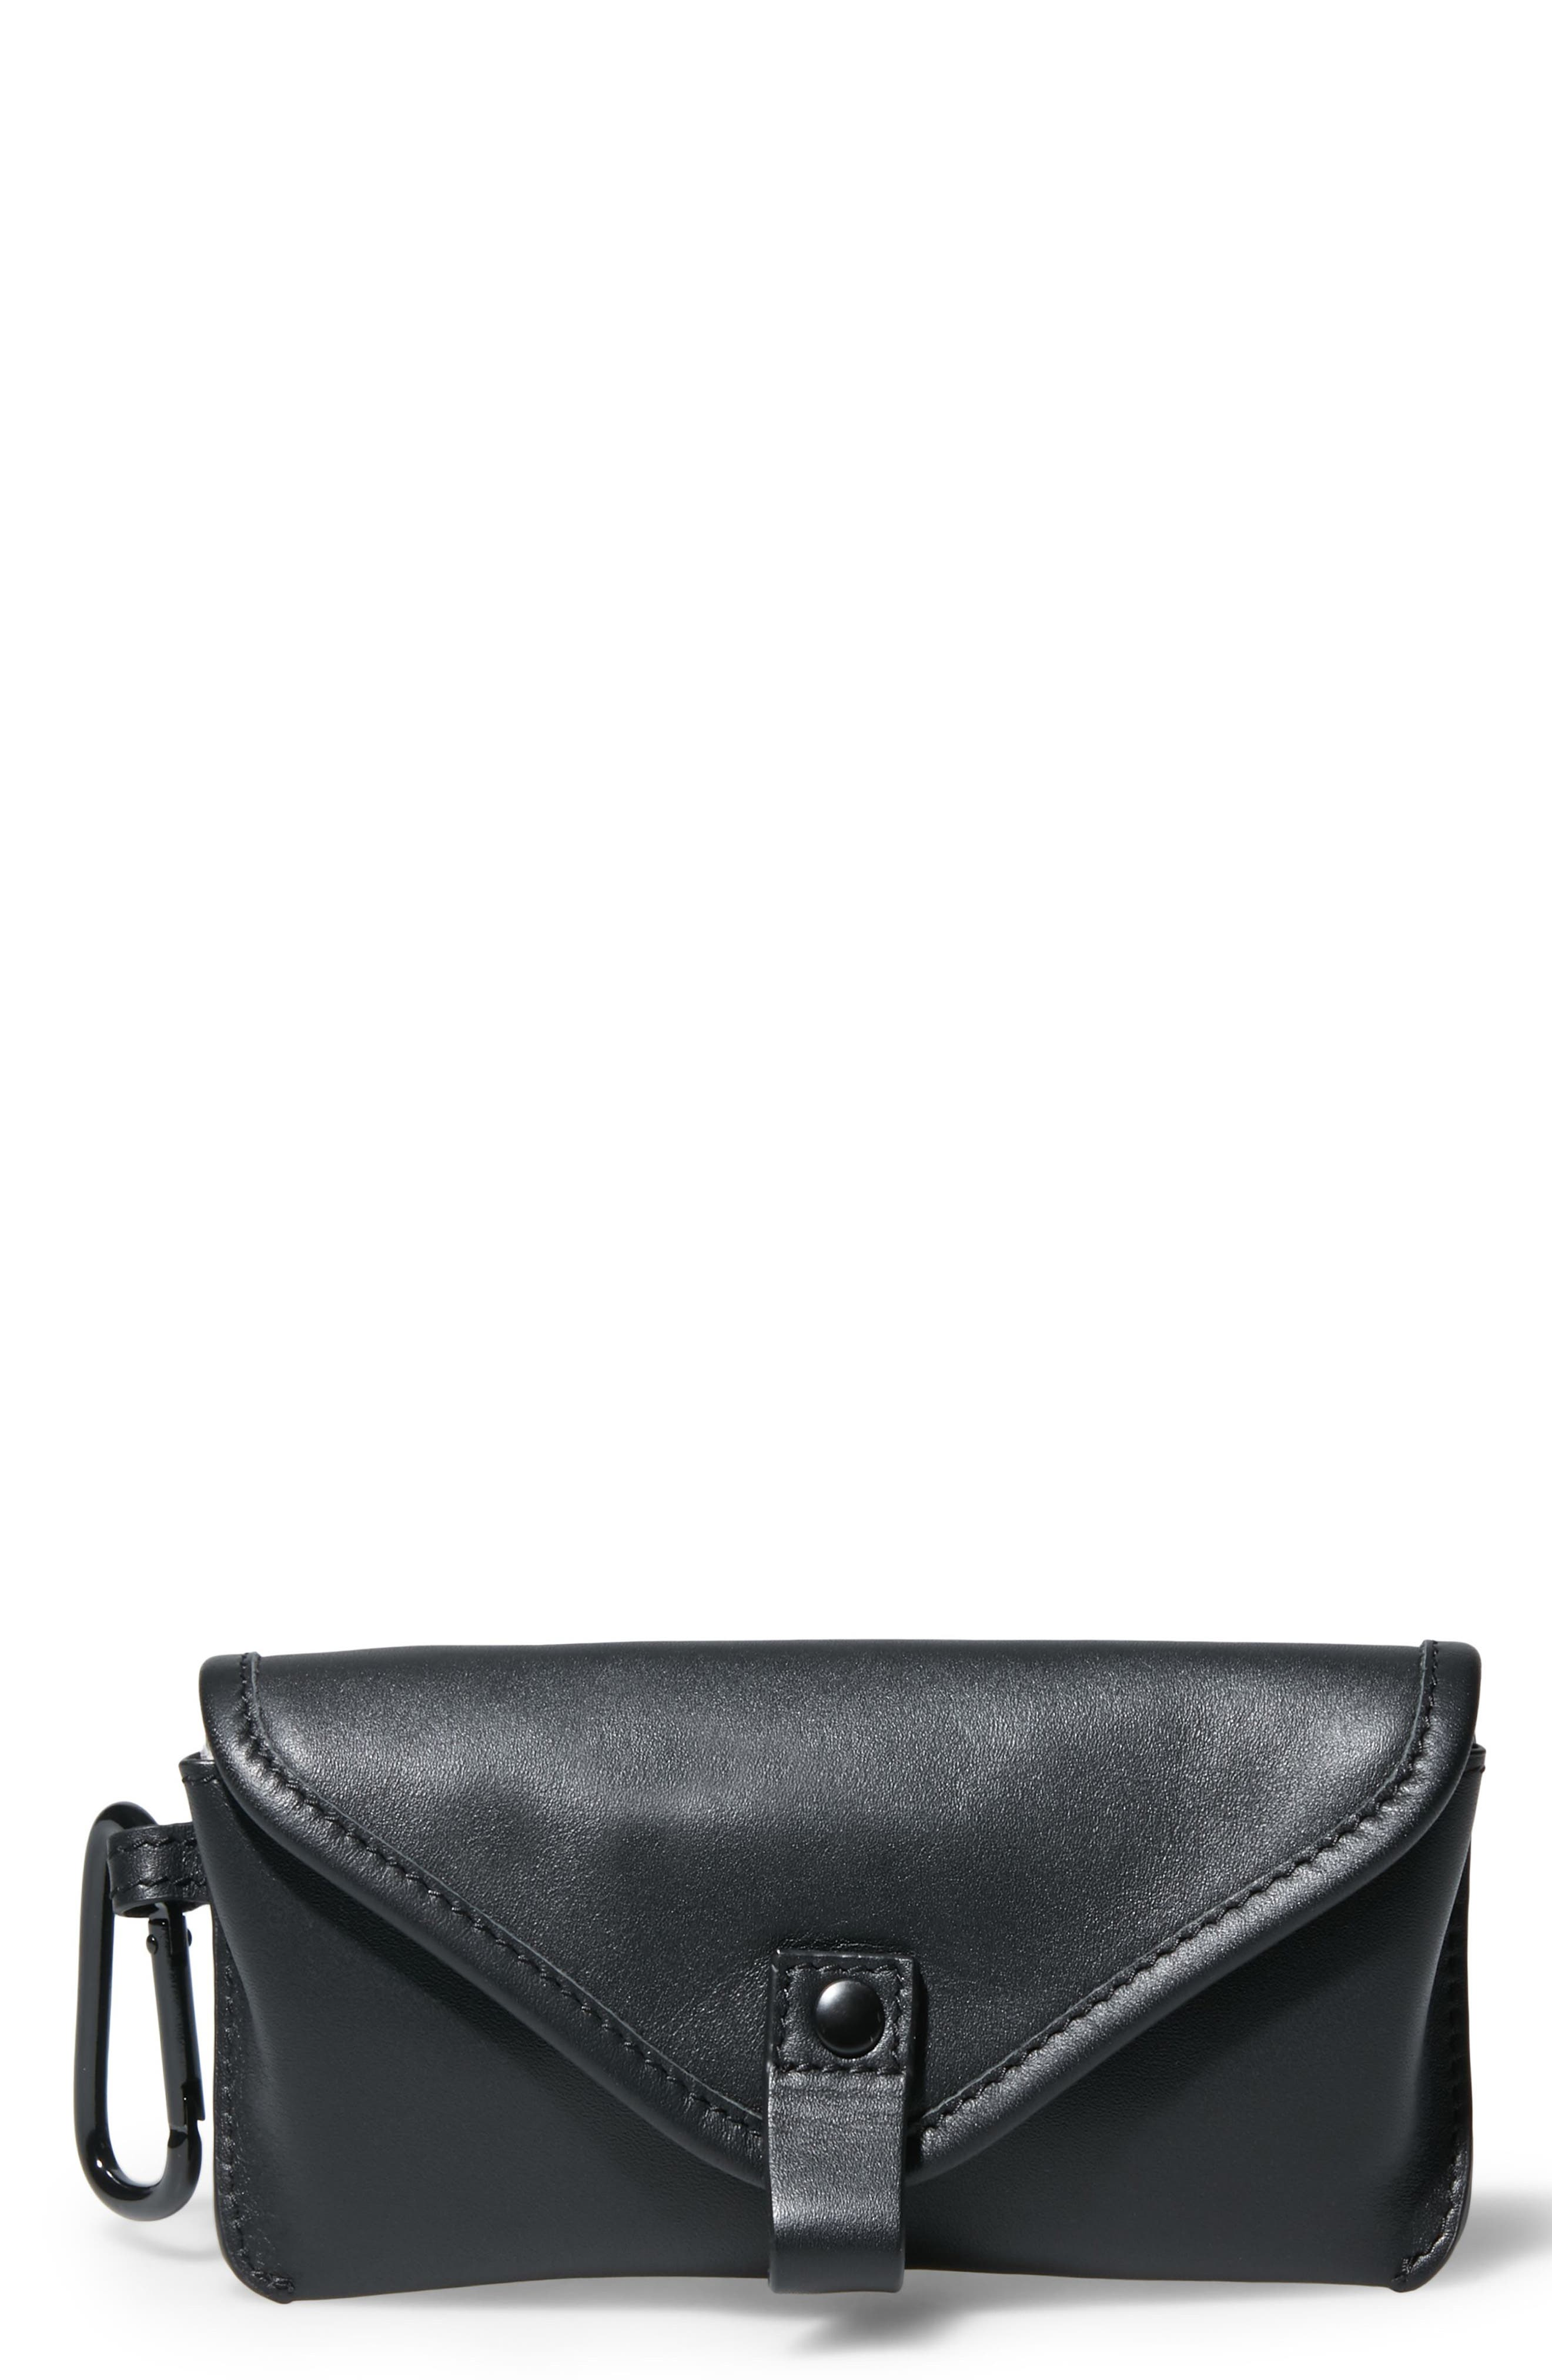 GQ x Steve Madden Leather Sunglasses Case,                         Main,                         color, Black